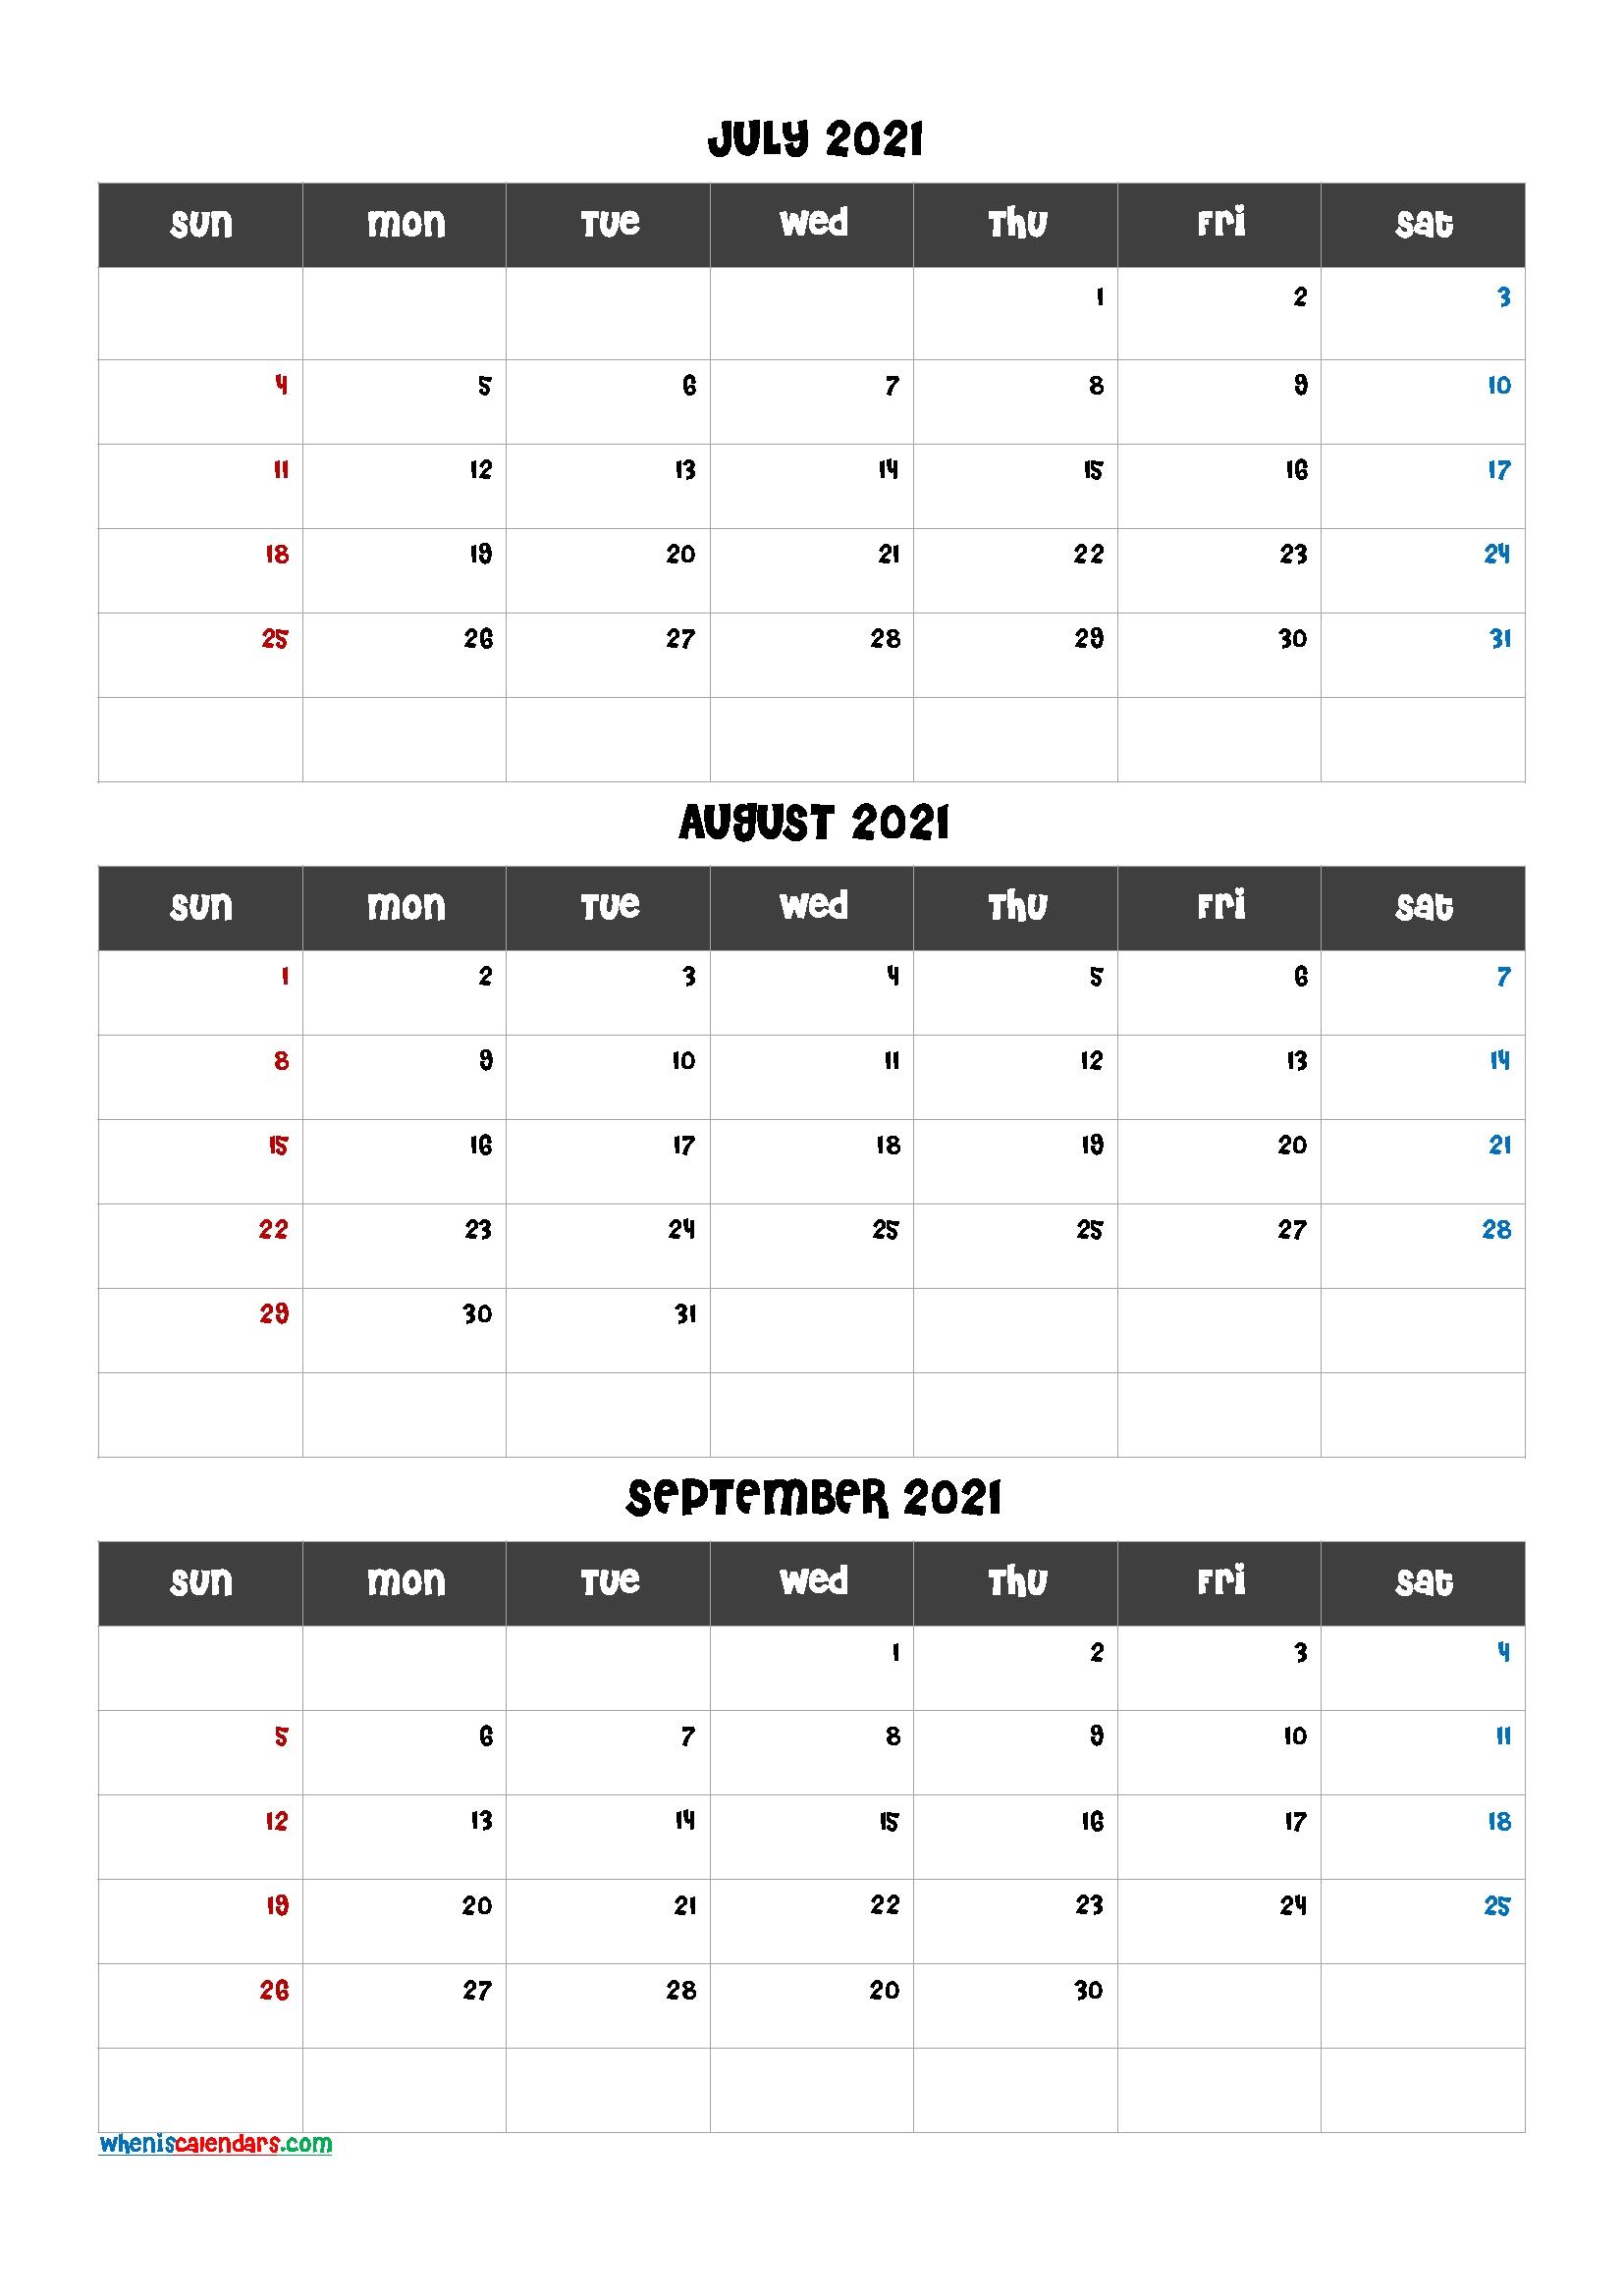 April May June 2021 Calendar Template - Calendraex February March April May June 2021 Calendar